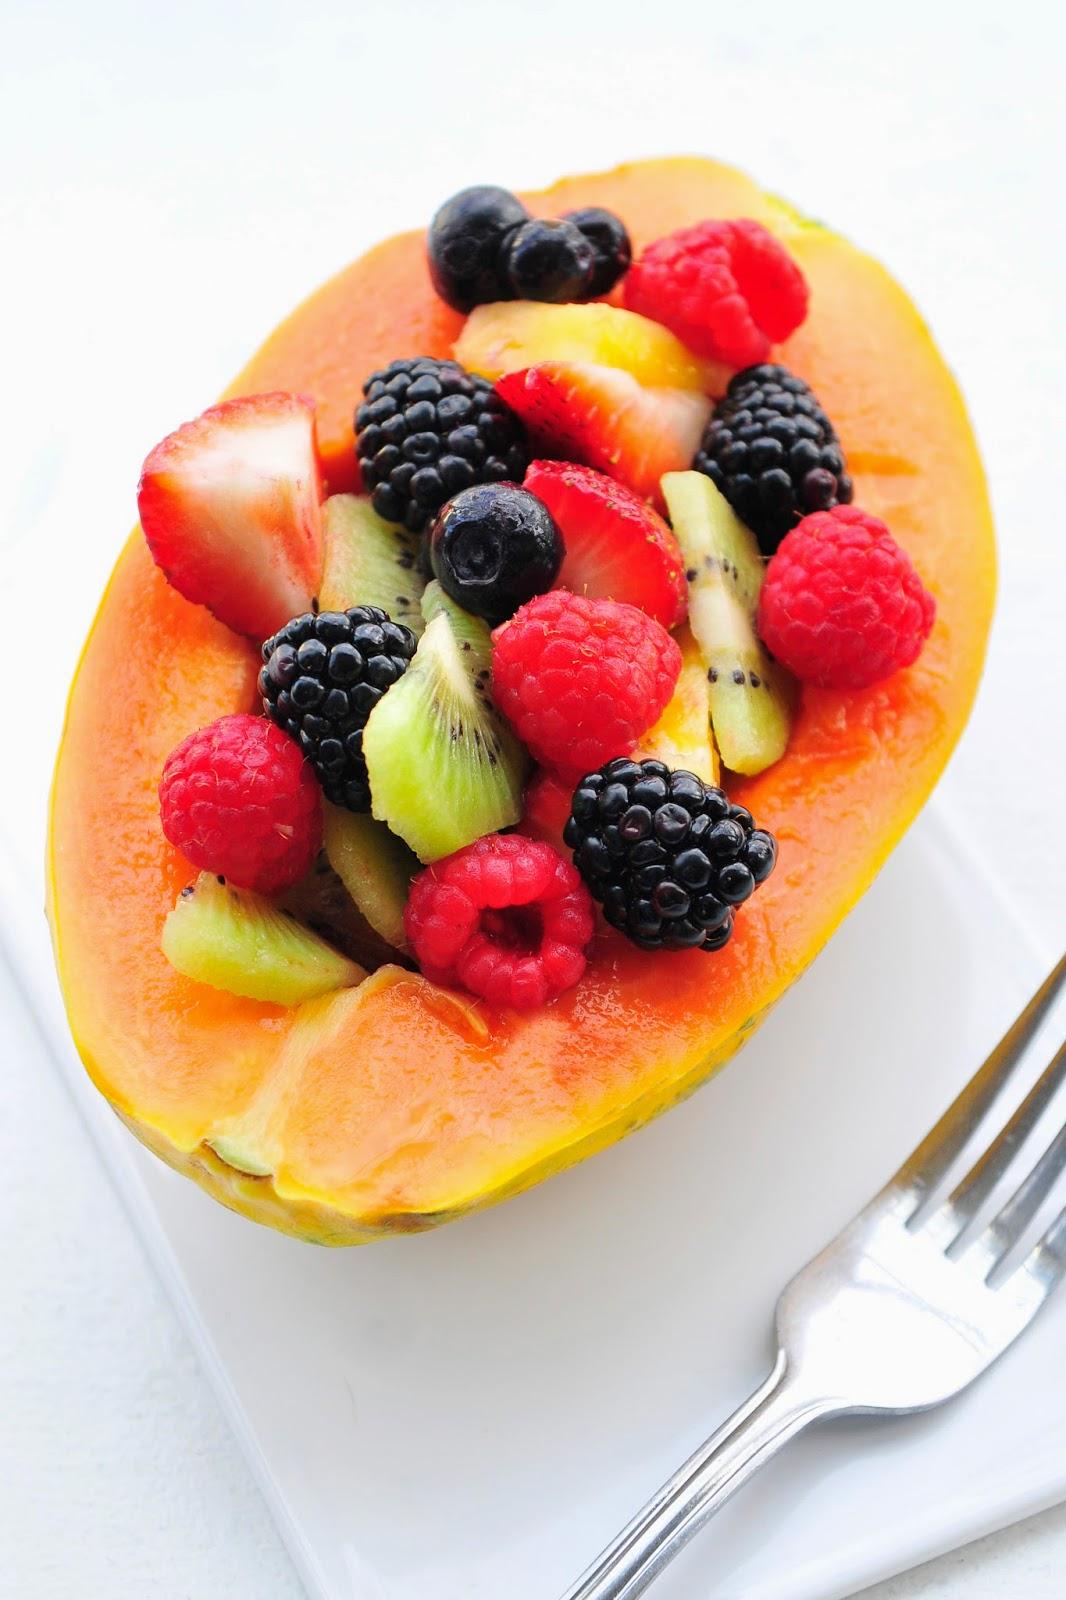 Simply Gourmet Papaya Fruit Salad 3 Years Of Blogging